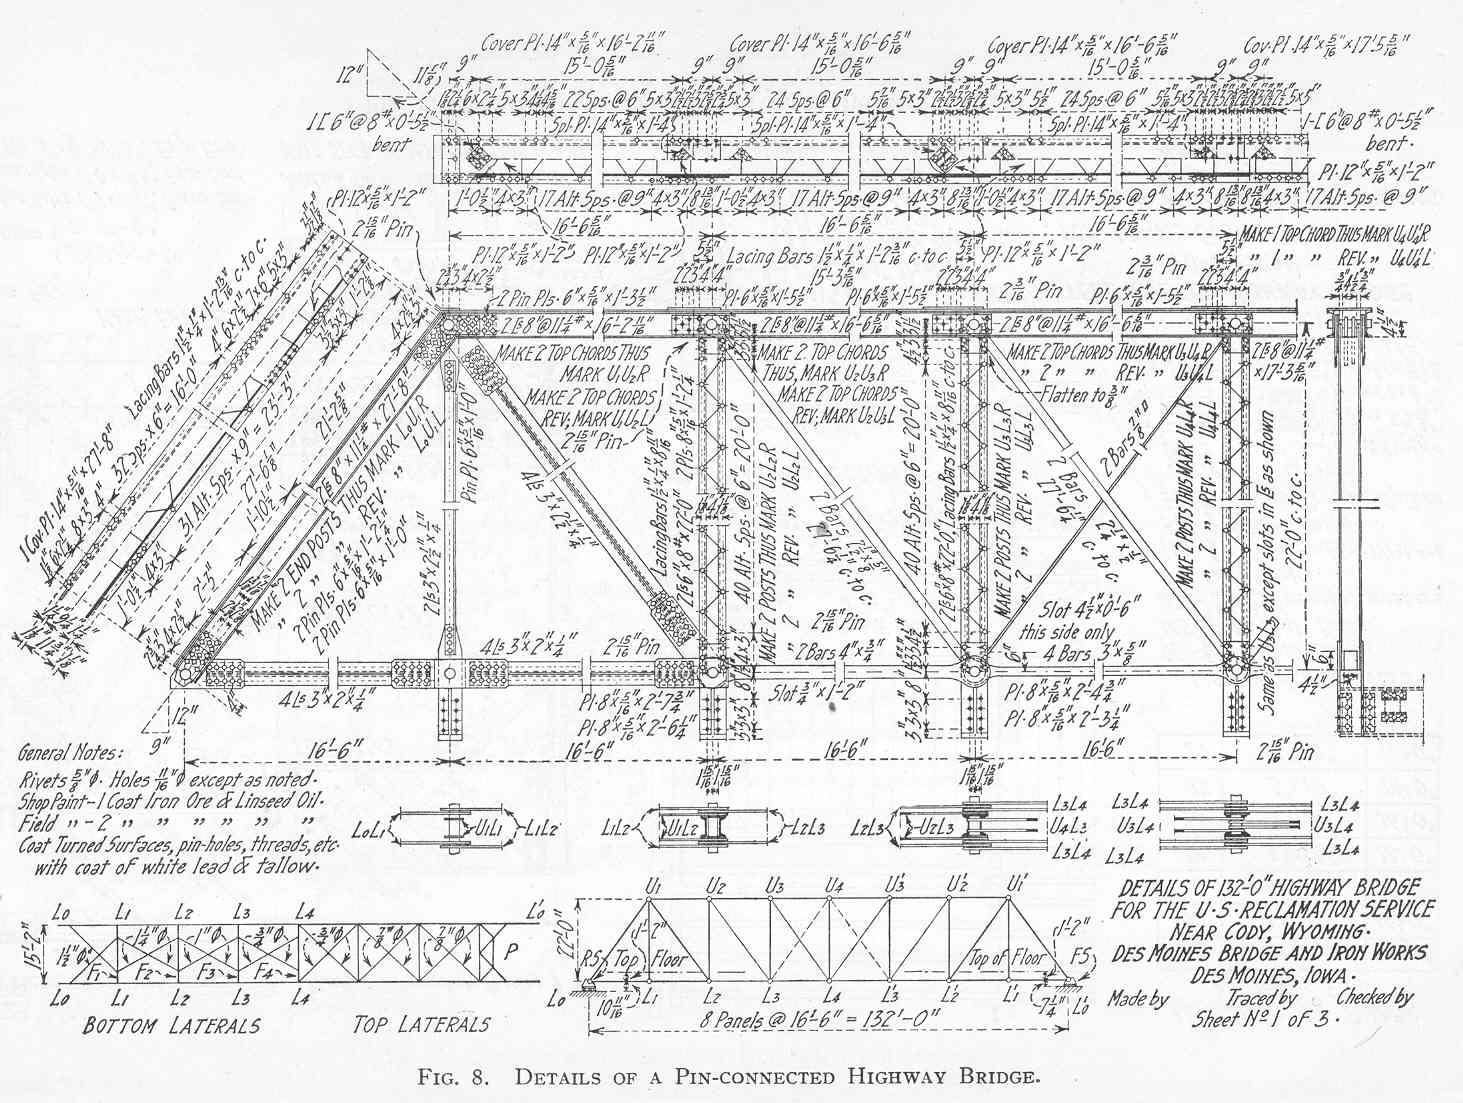 Truss Bridge Plans And Parts Warren Diagram Component Inside Details Of A Pin Connected Thru Pratt Span